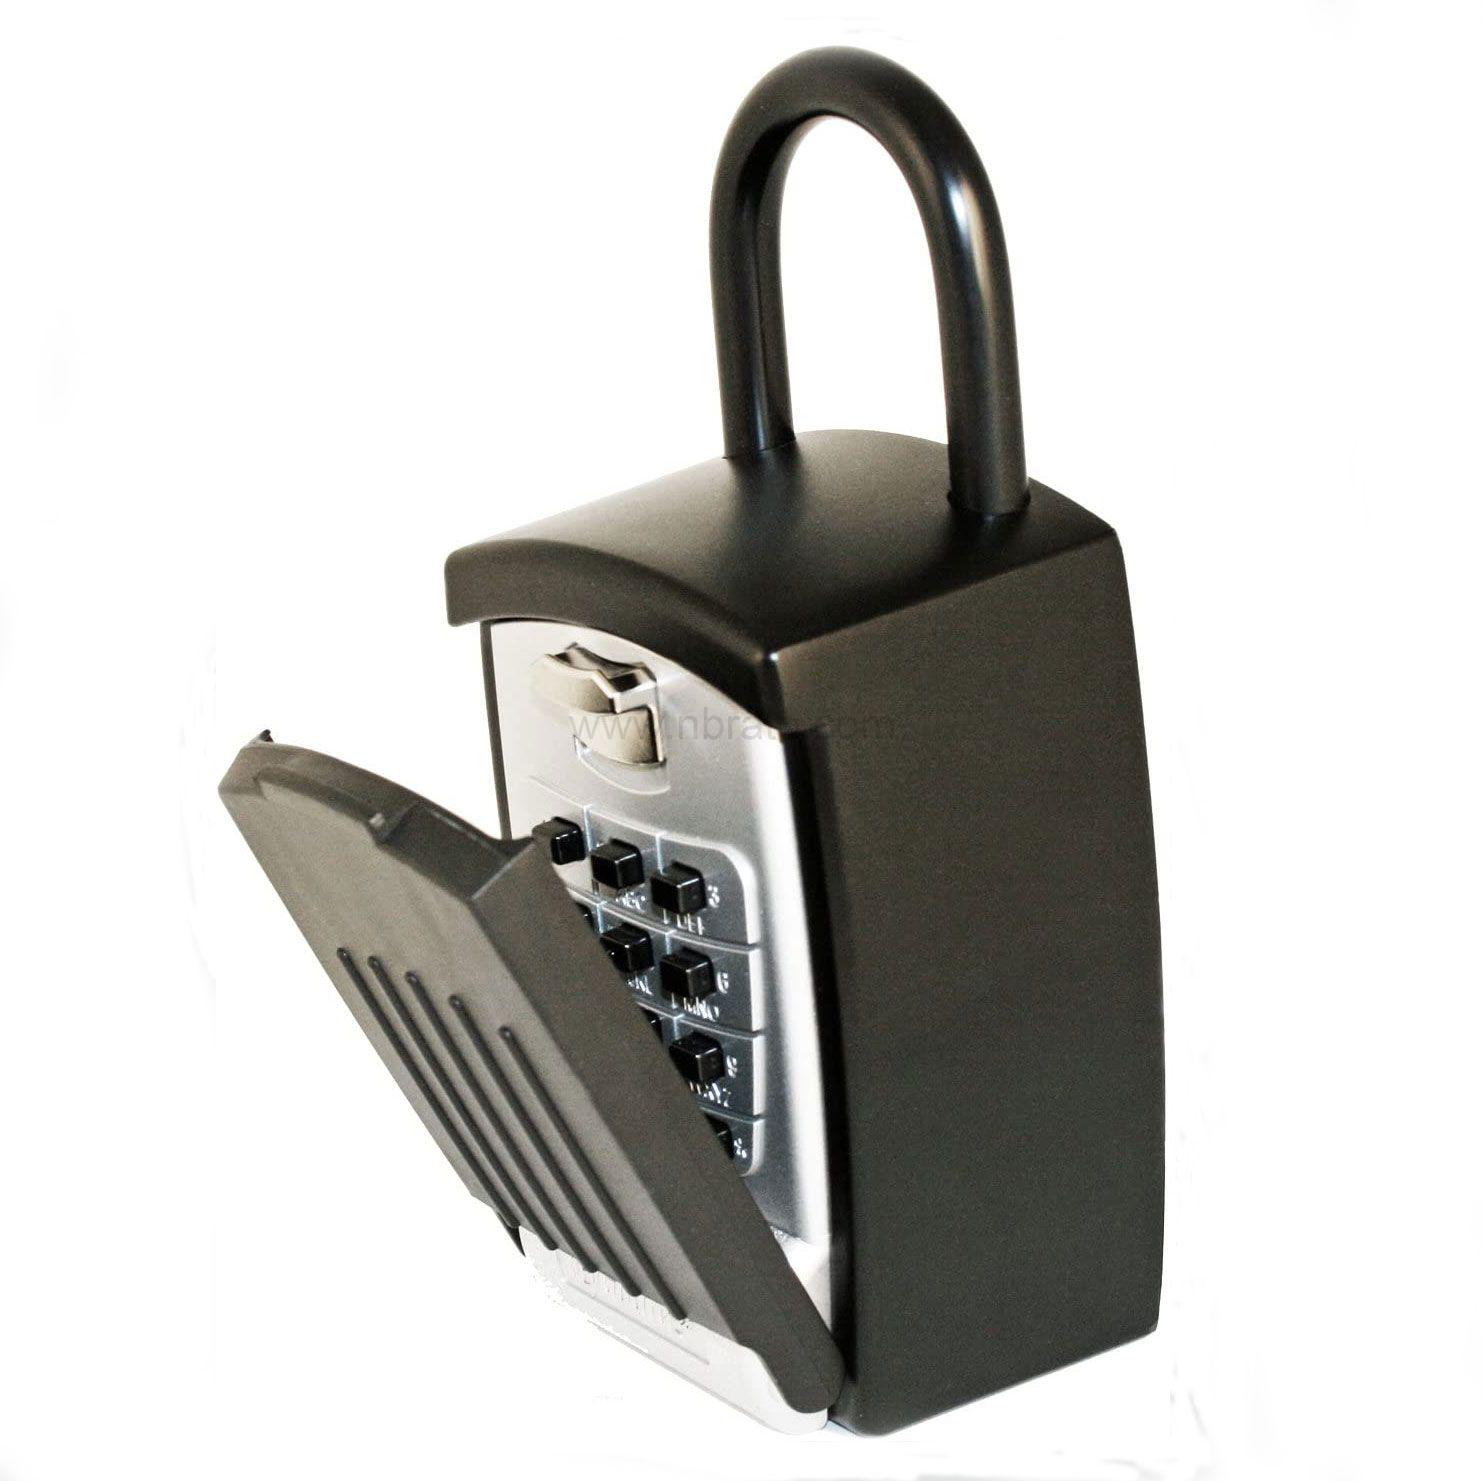 Punch Button Large Capacity Key Storage Anti theft Portable with Hook Shackle Lock Box Black Finish